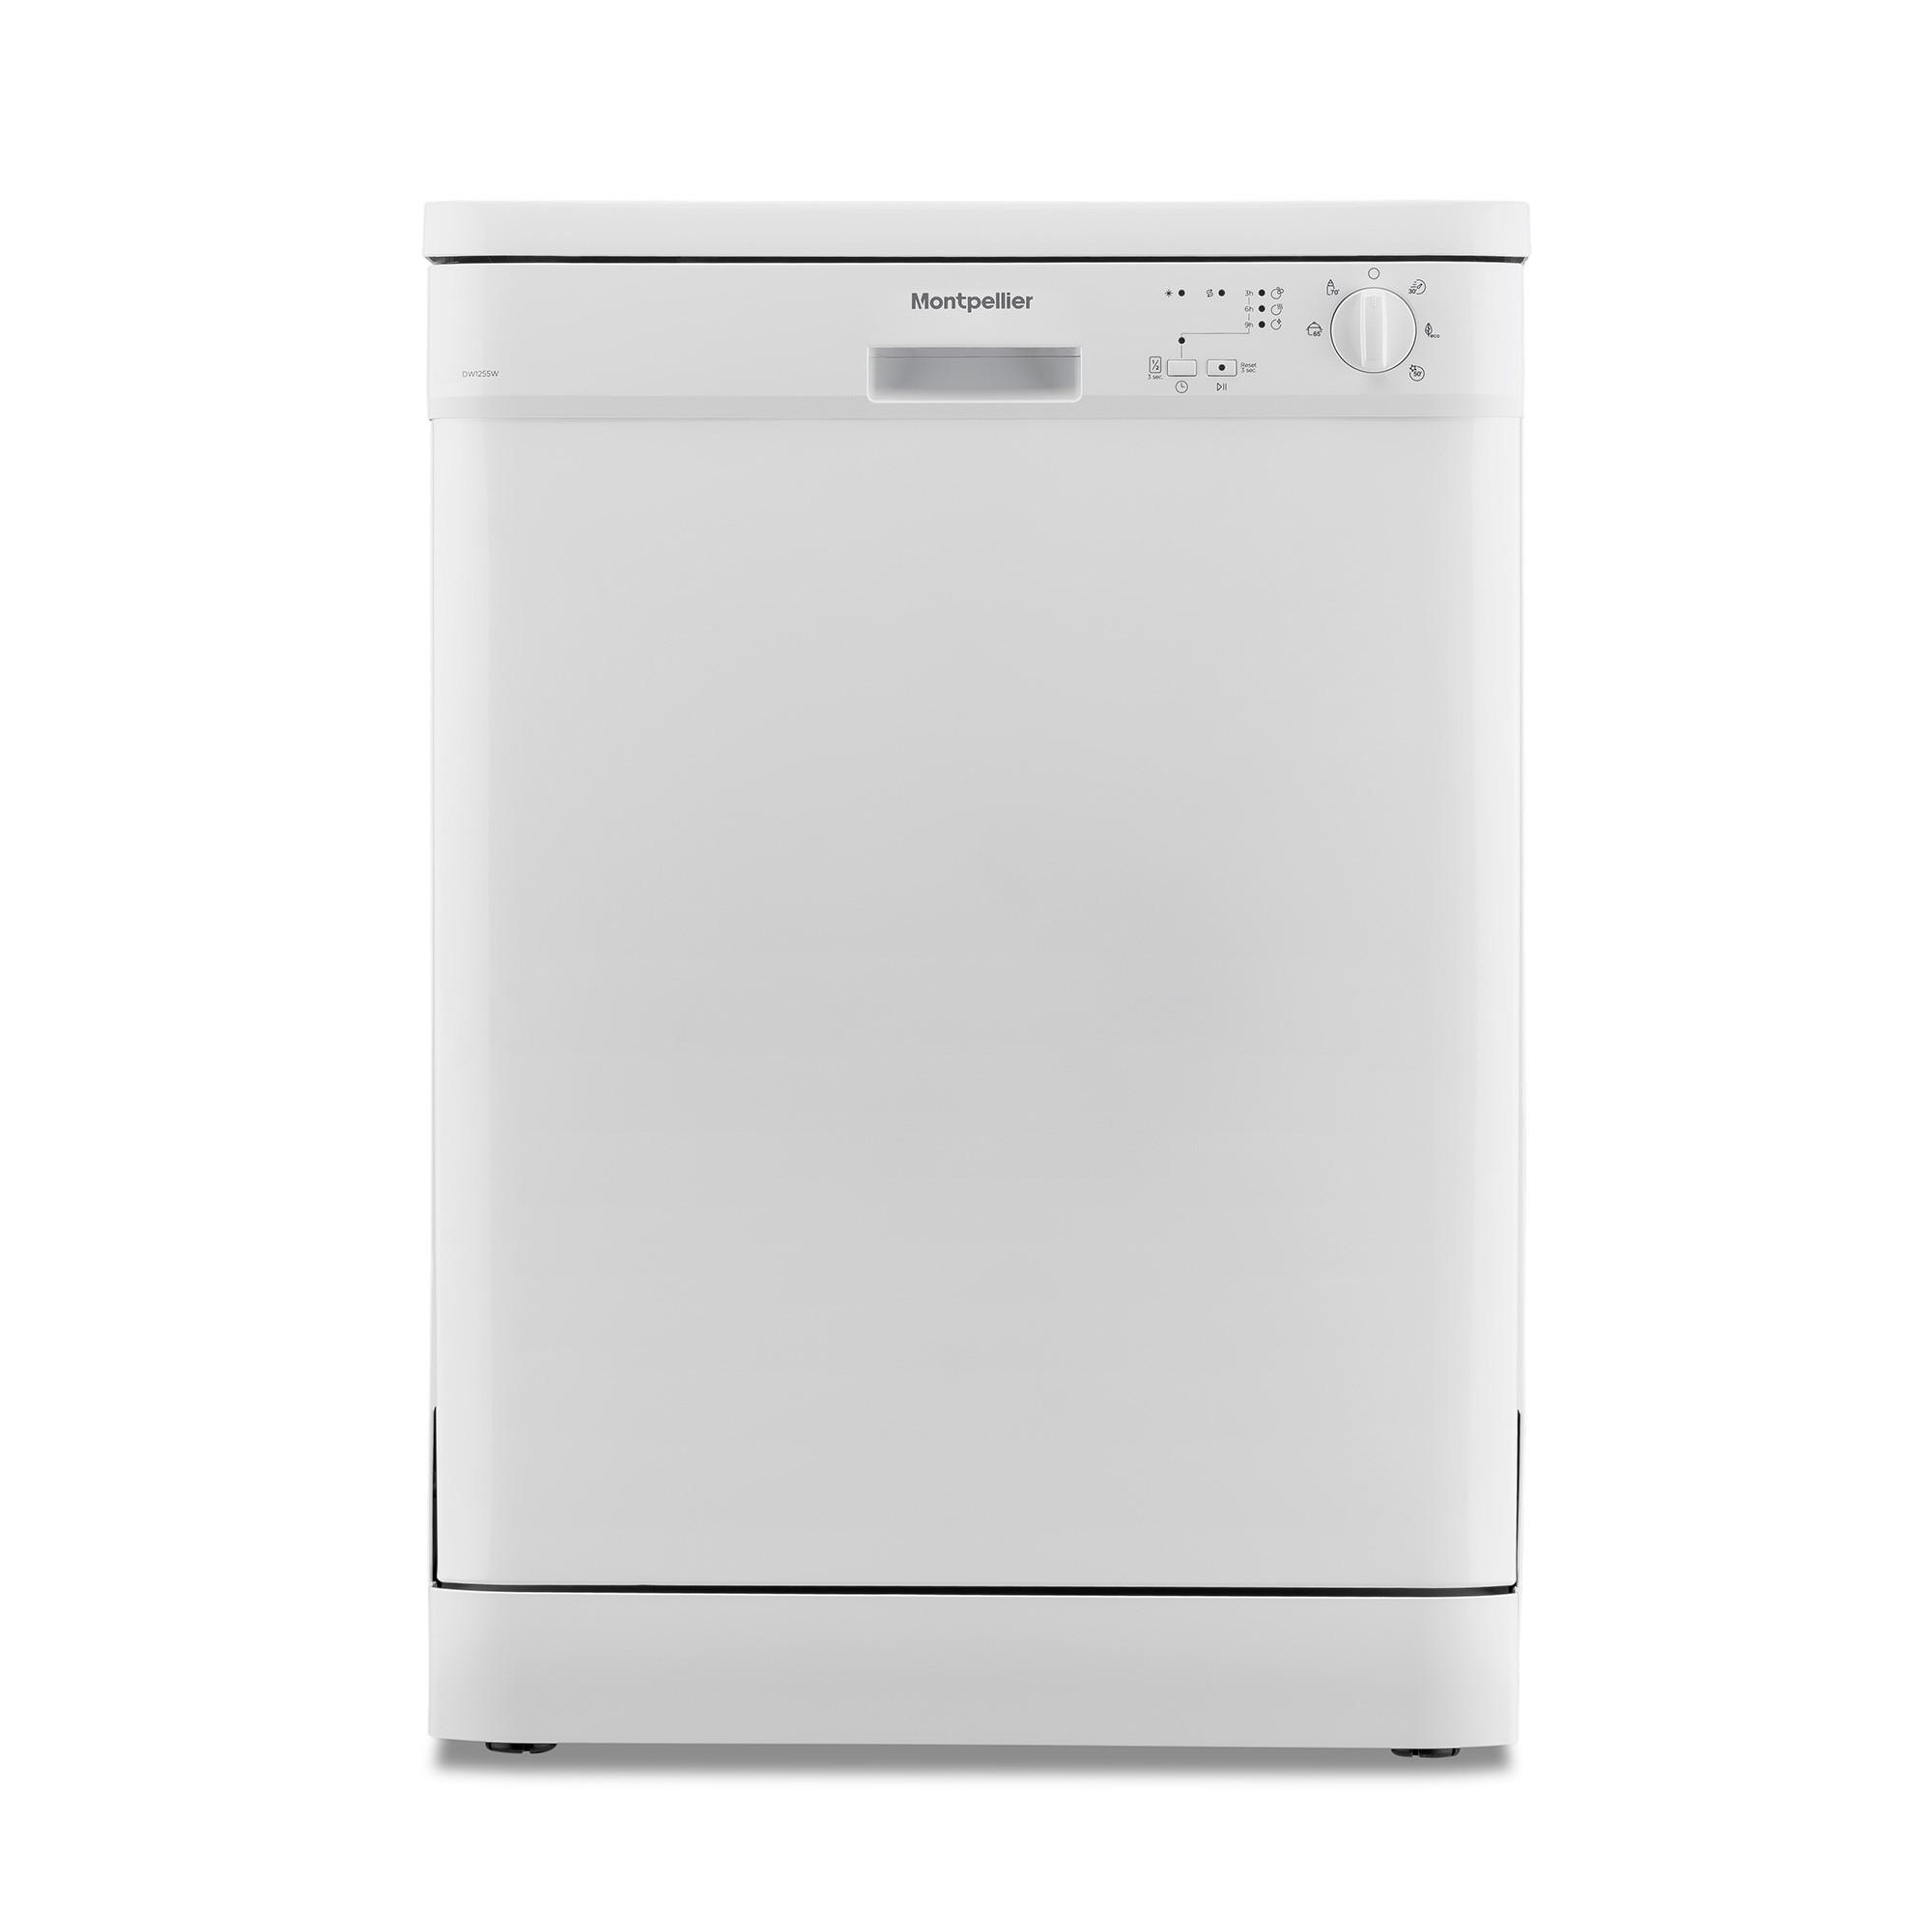 Montpellier DW1255W Full Size Dishwasher